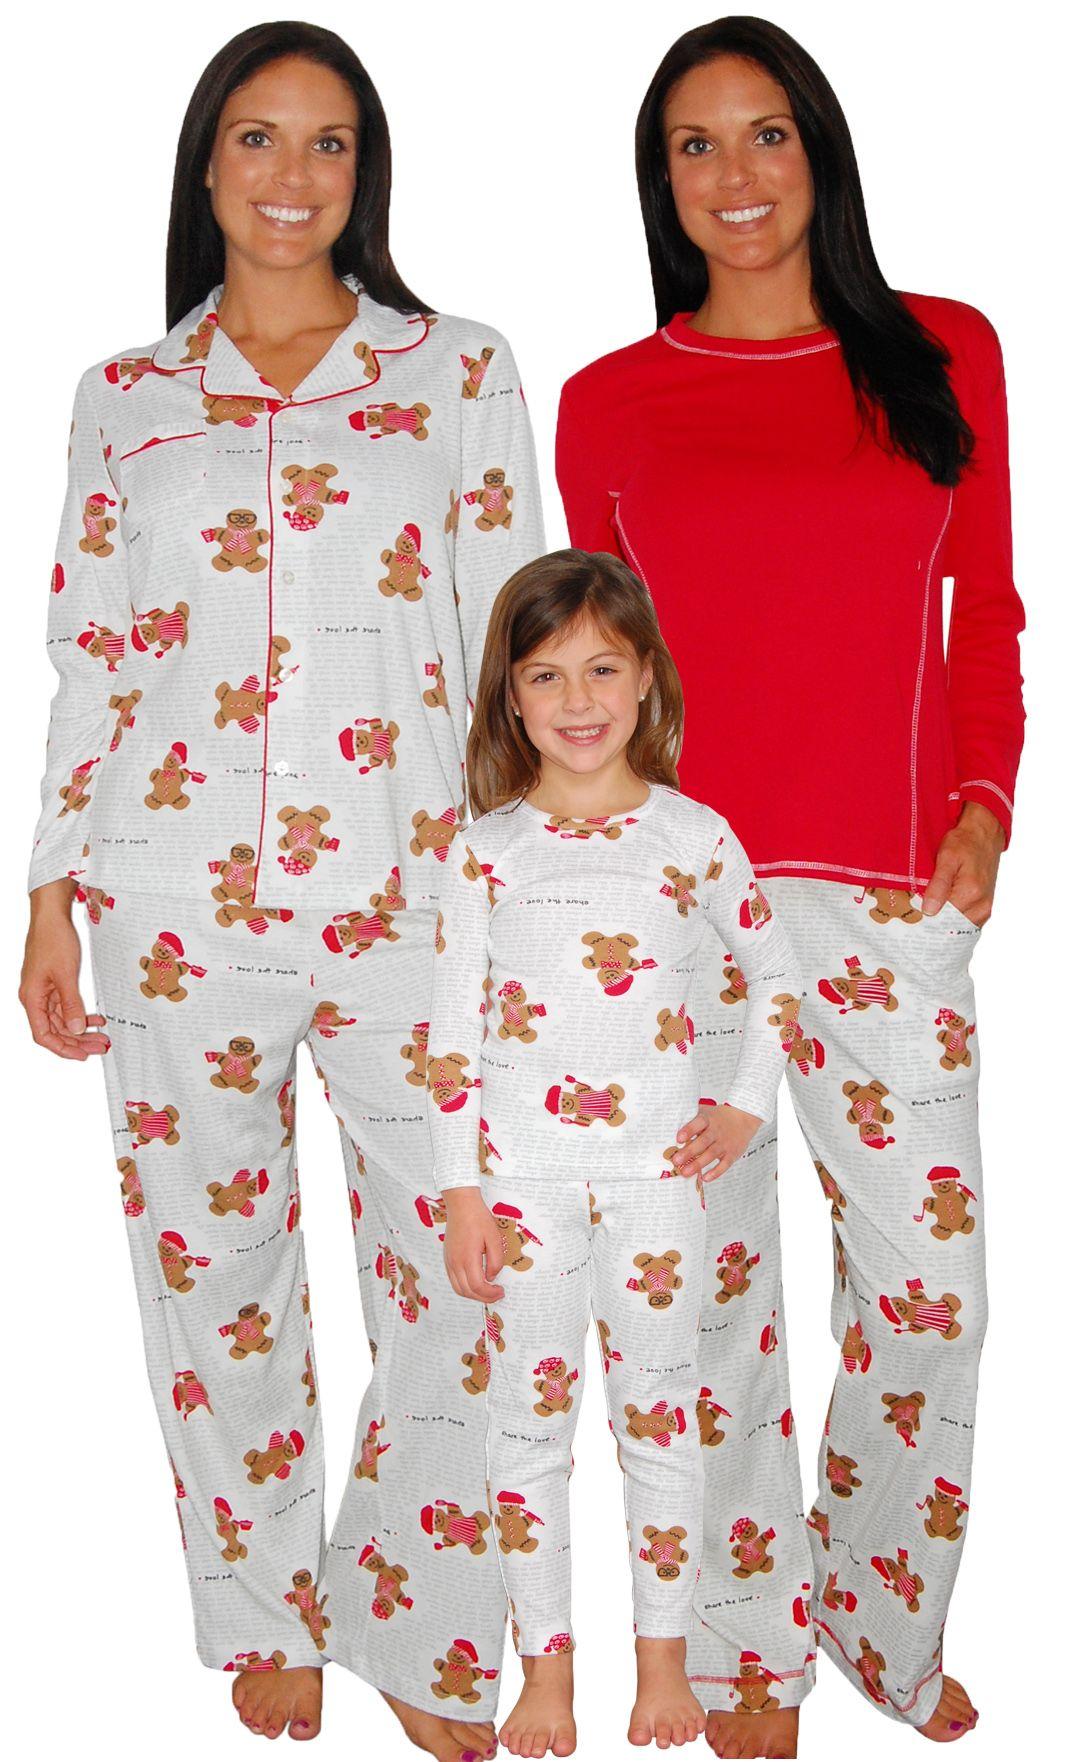 6cfb14f8b Matching Family Pajamas - A Holiday Tradition and Hot Christmas ...